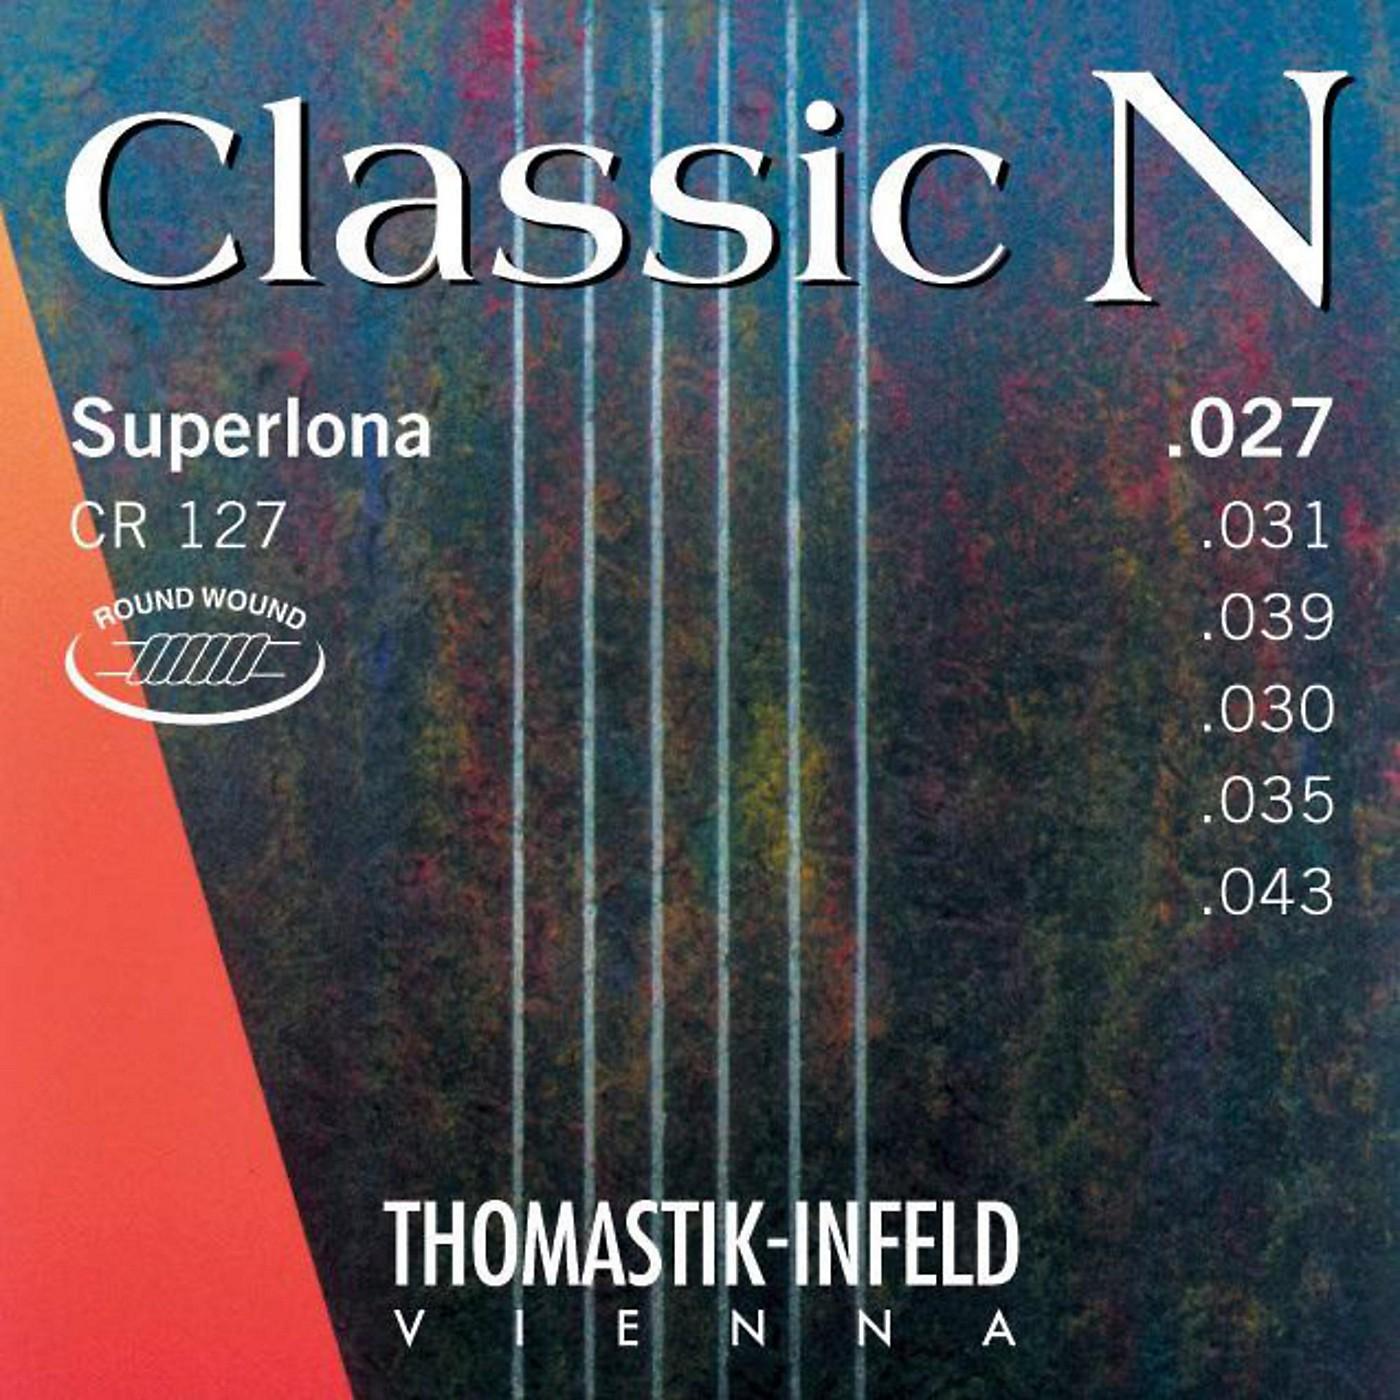 Thomastik CF127 N Series Nylon Guitar Strings - Normal Tension thumbnail